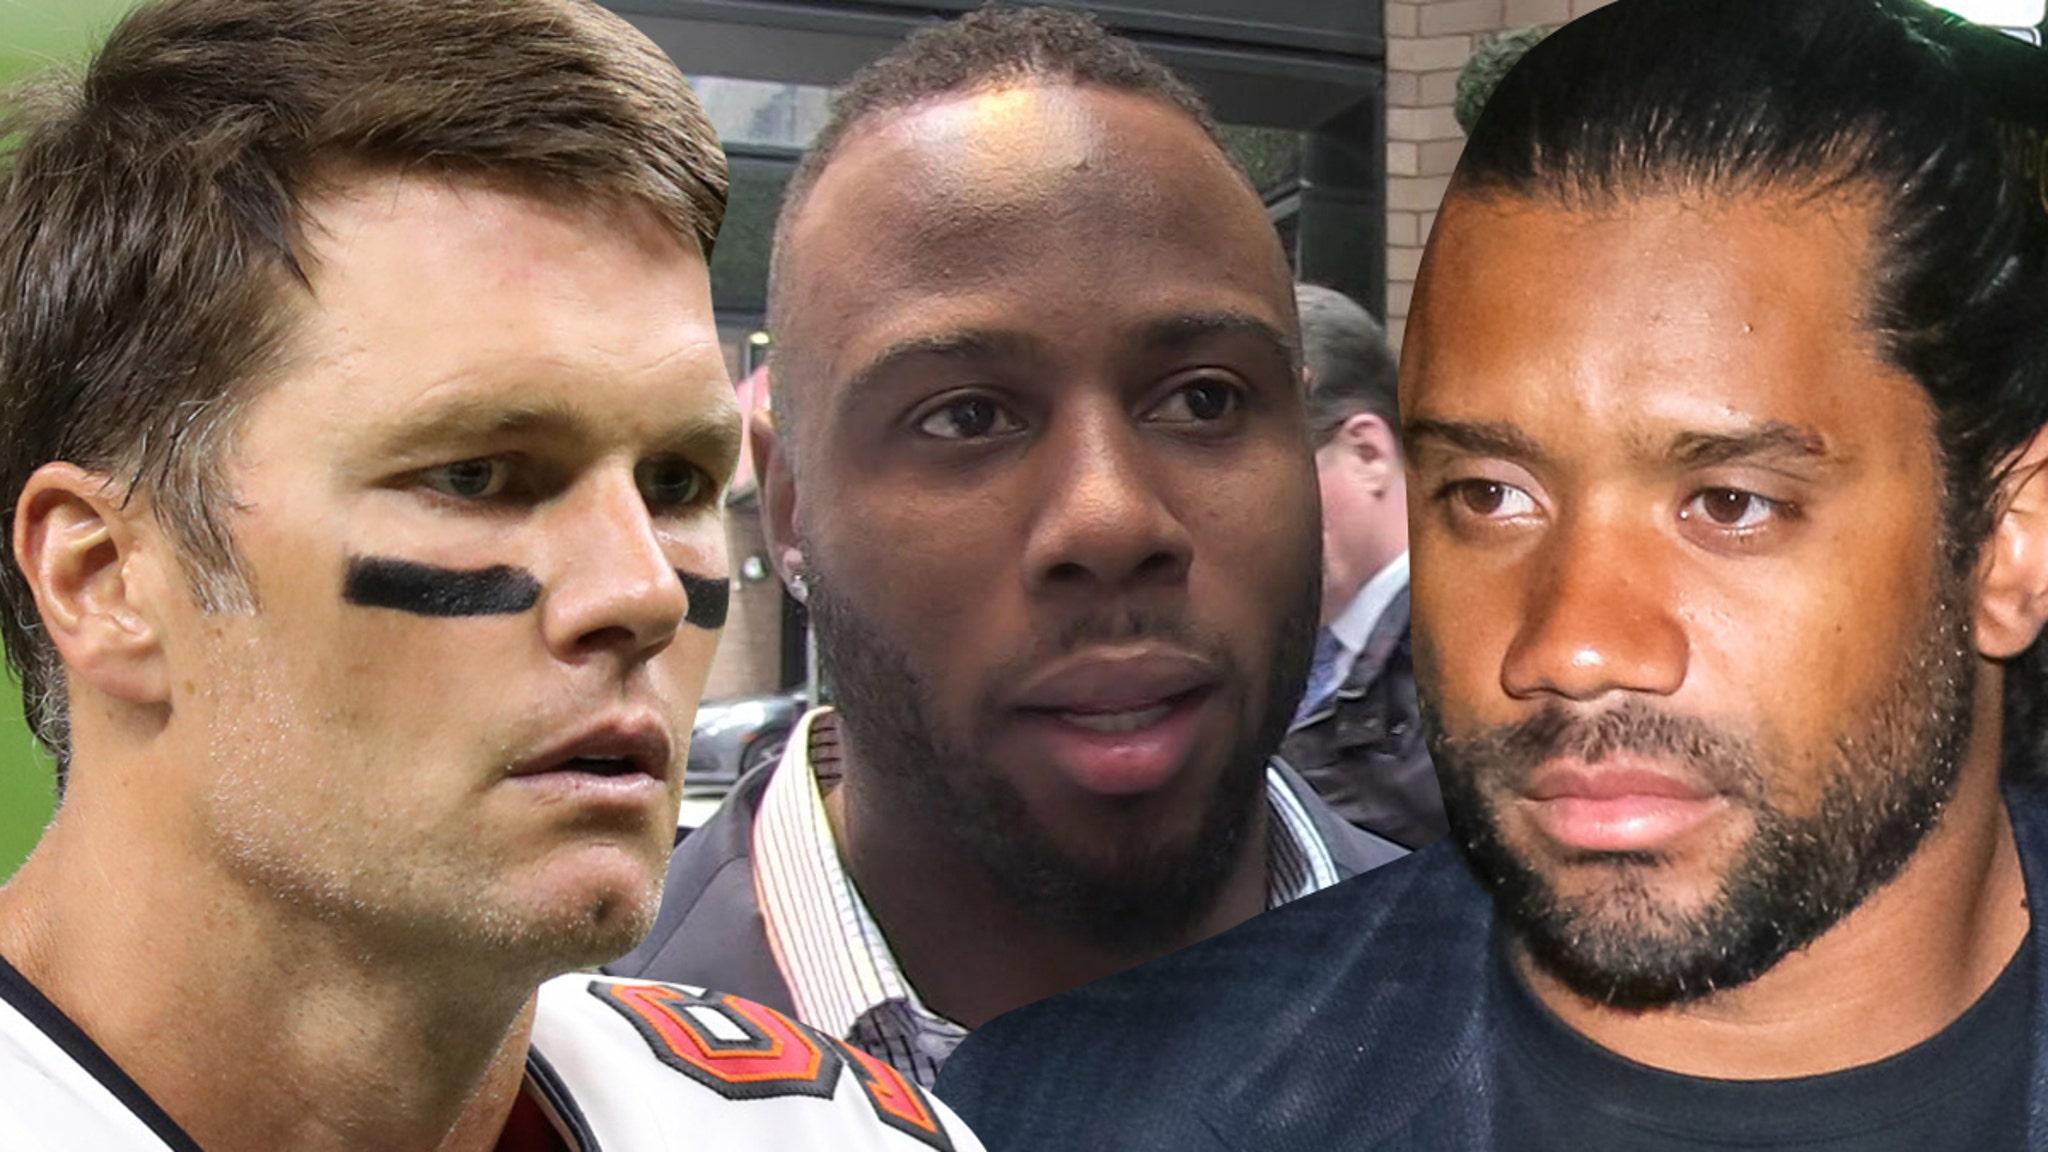 Tom Brady Heartbroken Over James White S Father S Death Russell Wilson Devastated